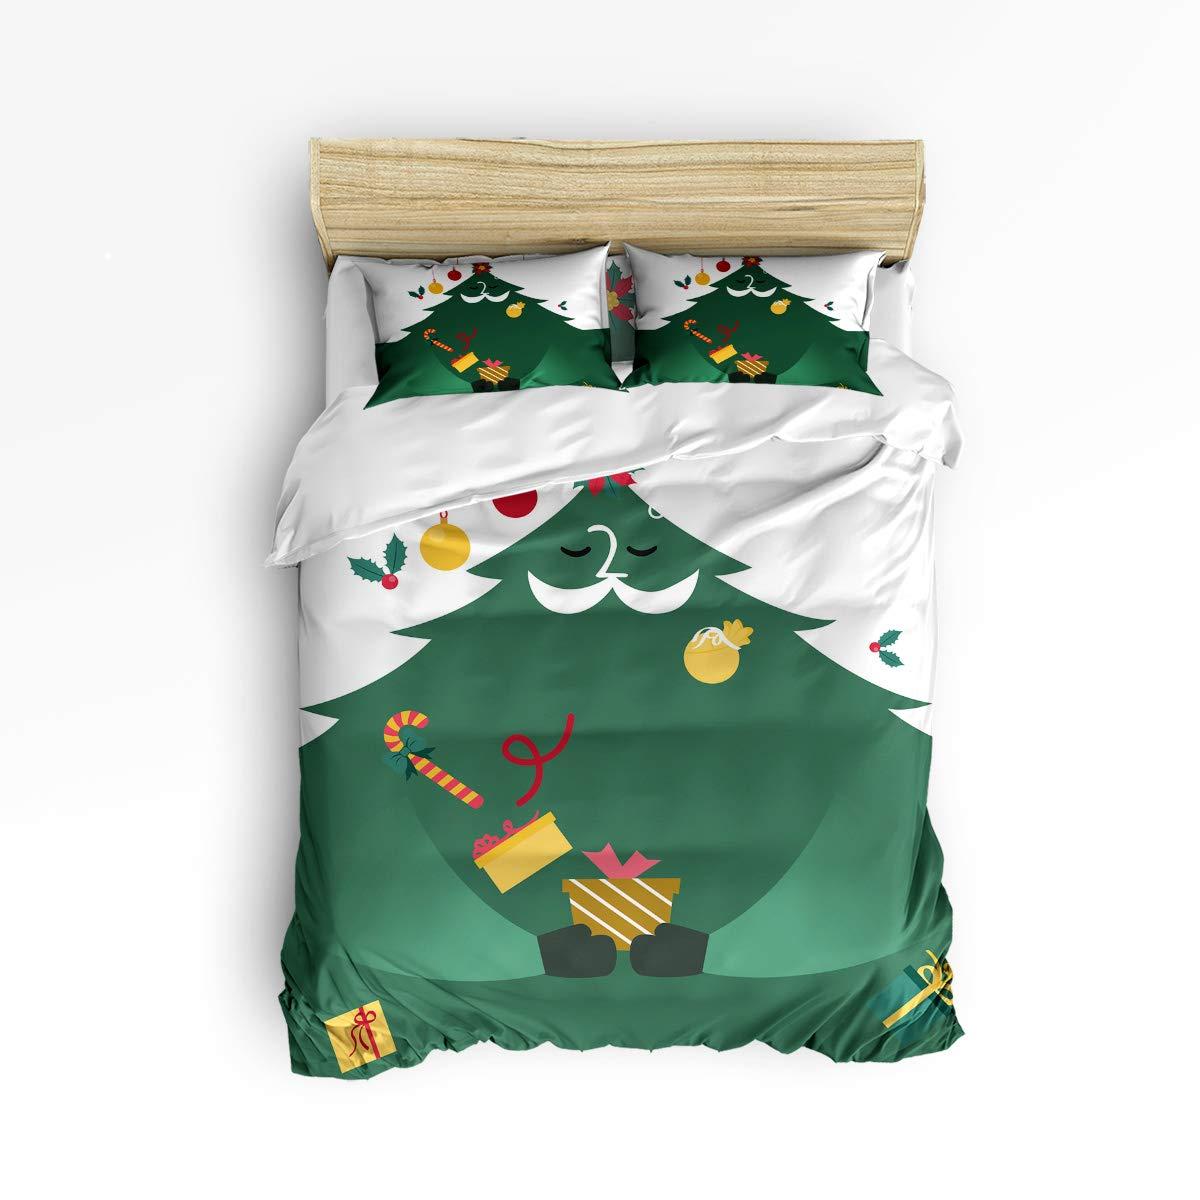 Anzona 寝具4点セット クリスマスプレゼントベル キャンディケーン デコレーション オーナメント ツリーに吊り下げ 4ピース 羽毛布団カバーセット ベッドスプレッド デイベッド 子供/子供/ティーン/大人用 King Size 181022-zly4pcsbeds-SWTQ00377SJTDAZN B07JQDR4VH Gift4azn3157 King Size